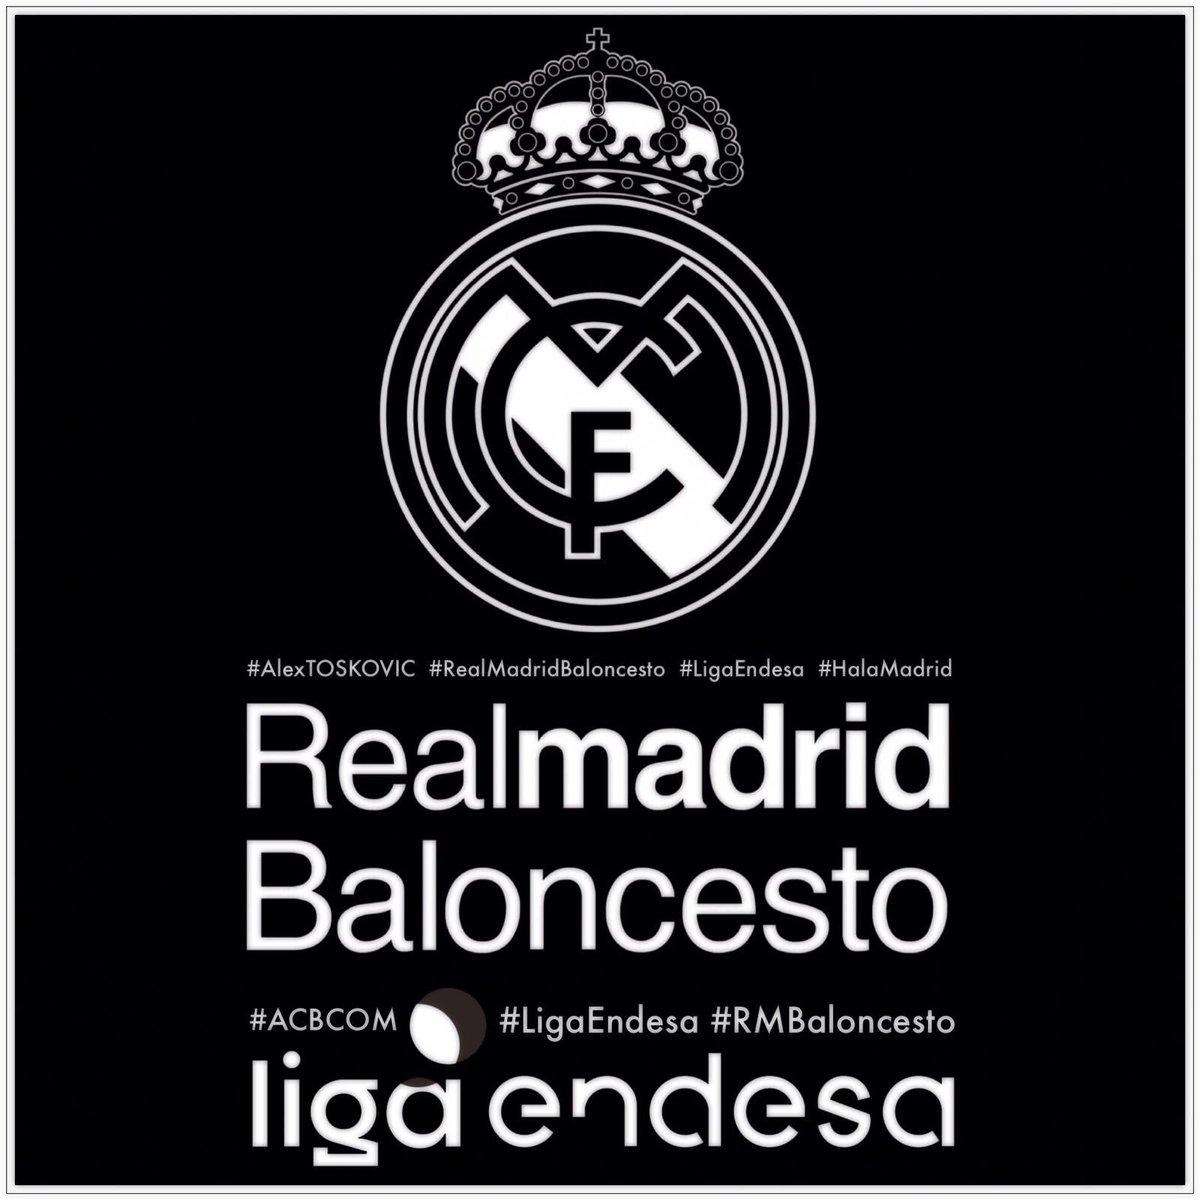 Round 1 - WIN! Onto the next one! #RMBaloncesto #VamosReal #HalaMadrid #LigaEndesa #AlexTOSKOVIC https://t.co/88U0xqZatU